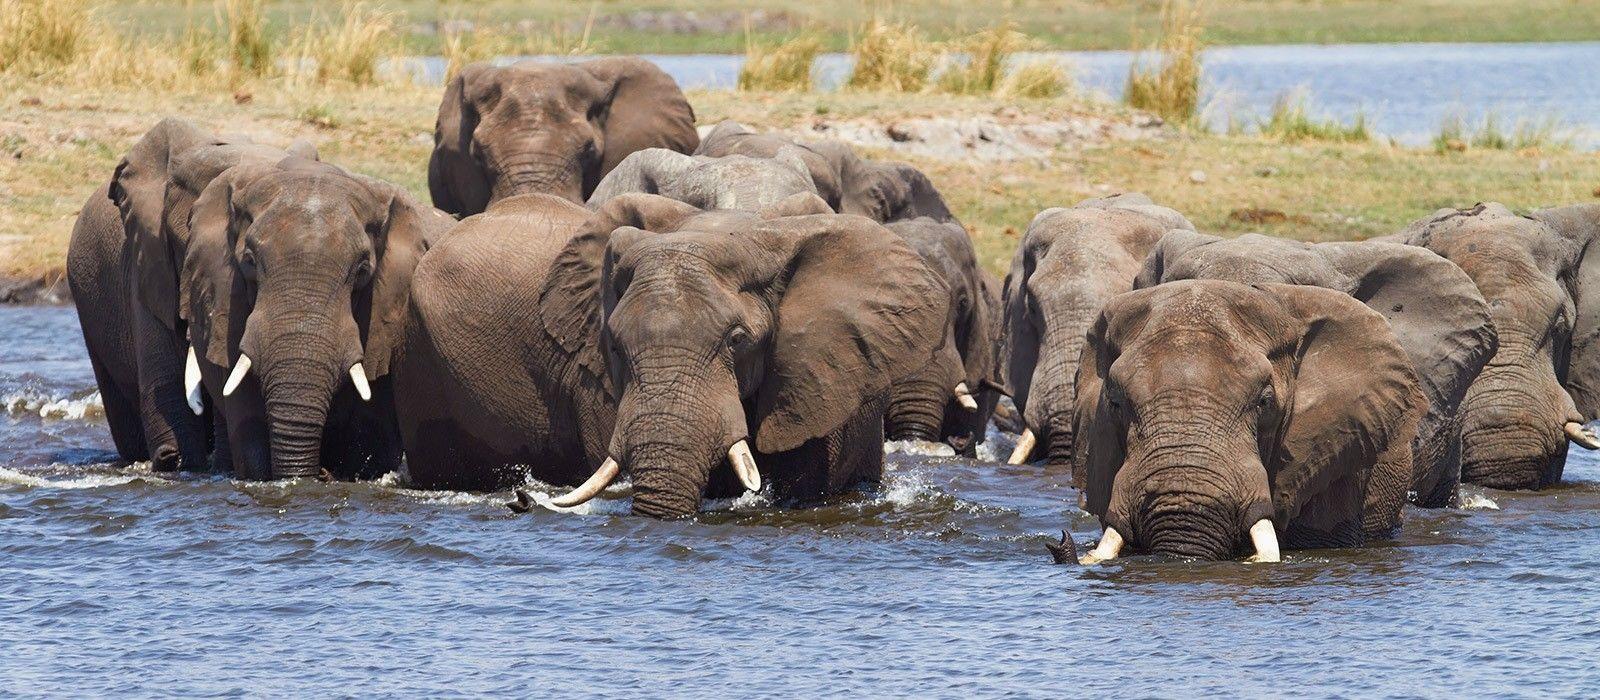 Victoria Falls and Botswana Highlights Tour Trip 2